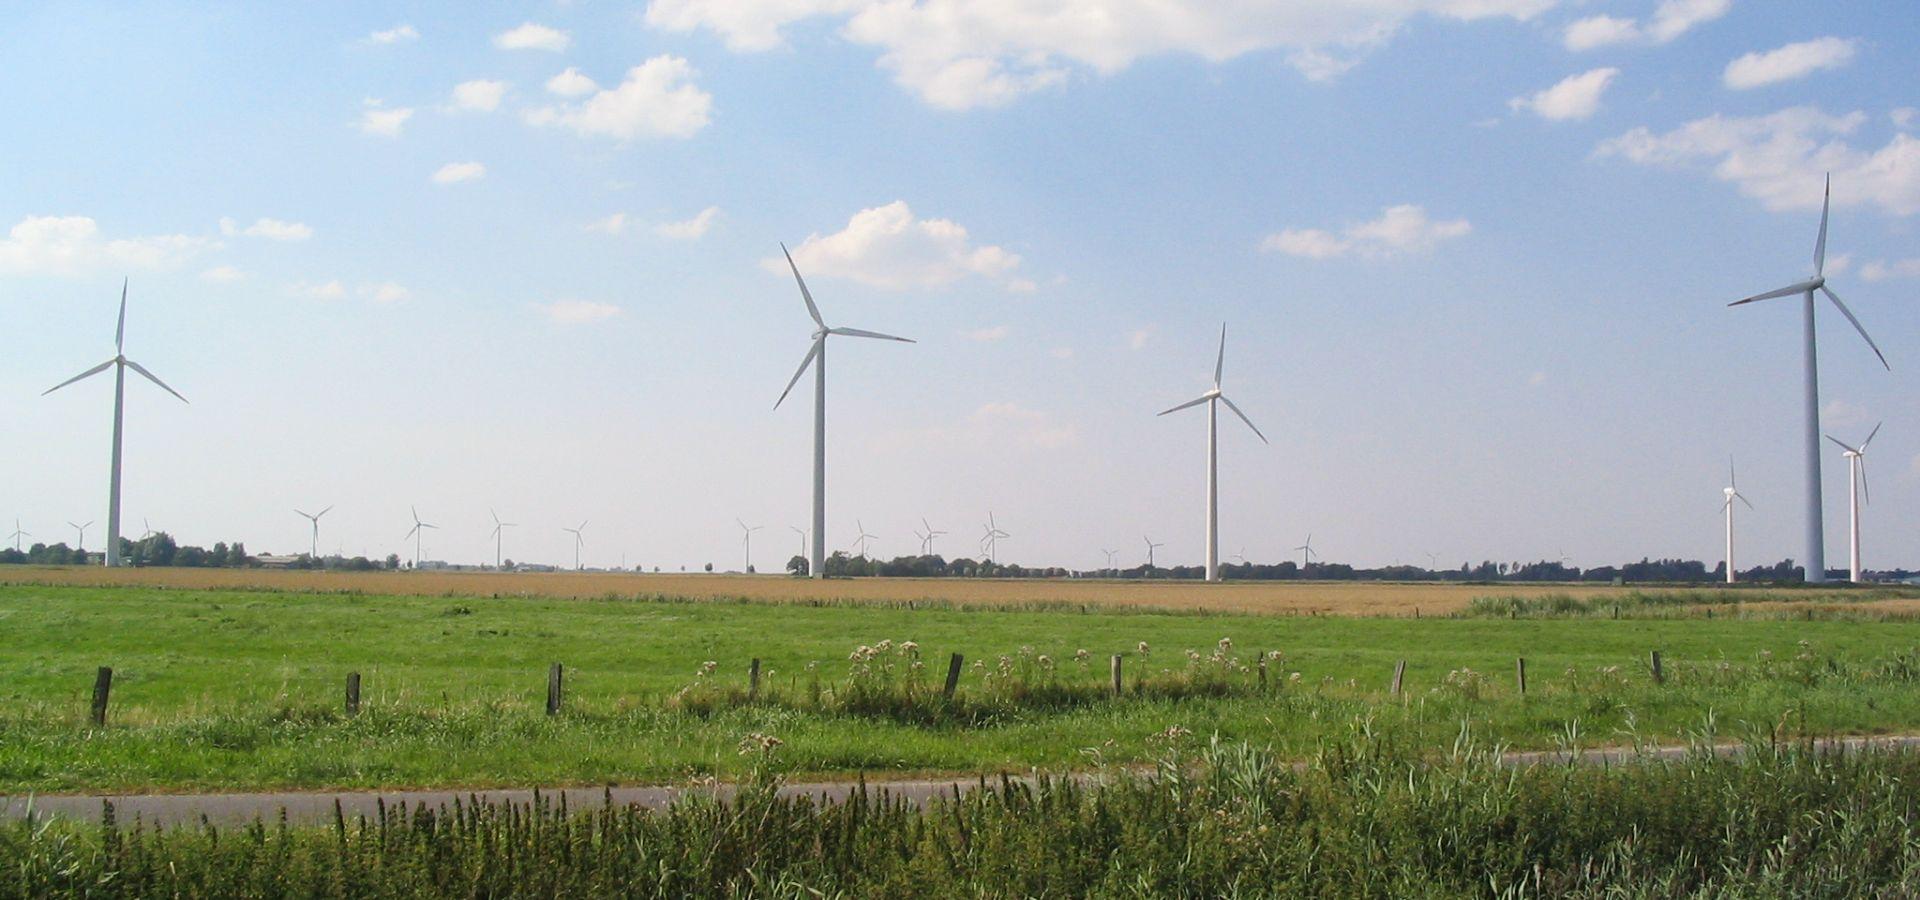 Fiasco, or success? Wind farm in Neuenkirchen, Germany (Photo by Dirk Ingo Franke, edited, CC BY-SA 1.0)